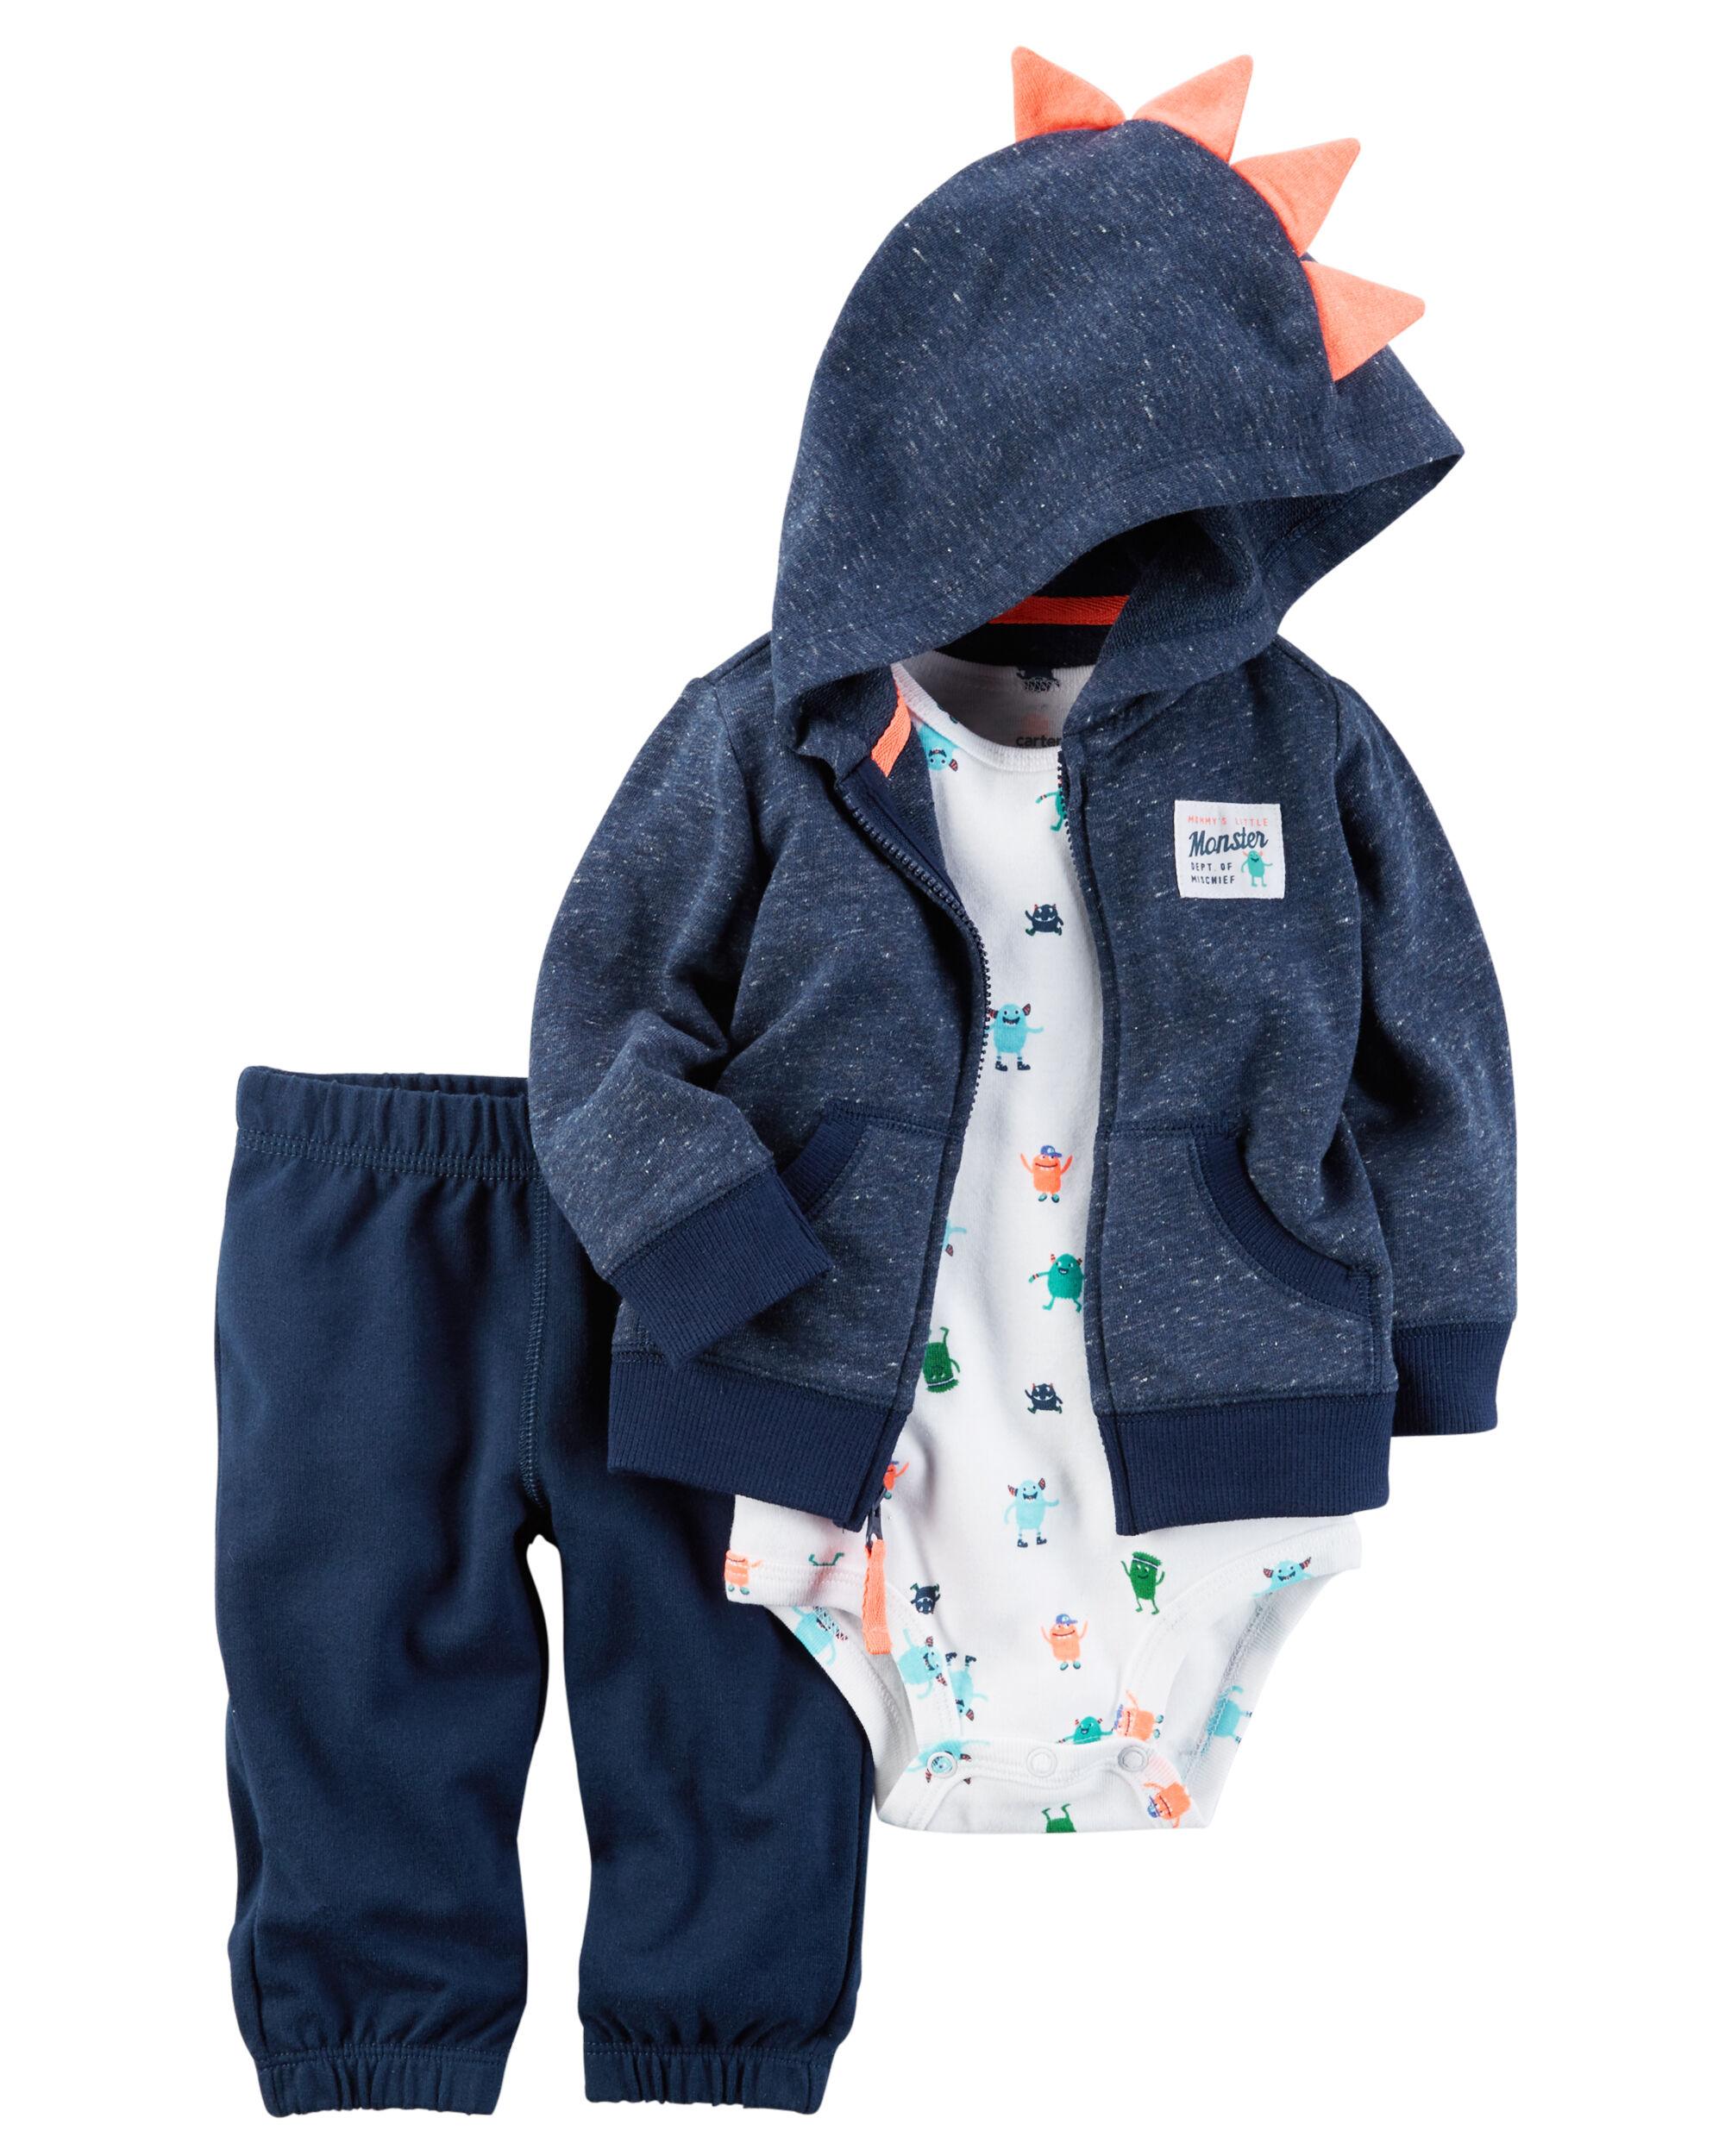 3 Piece Little Jacket Set